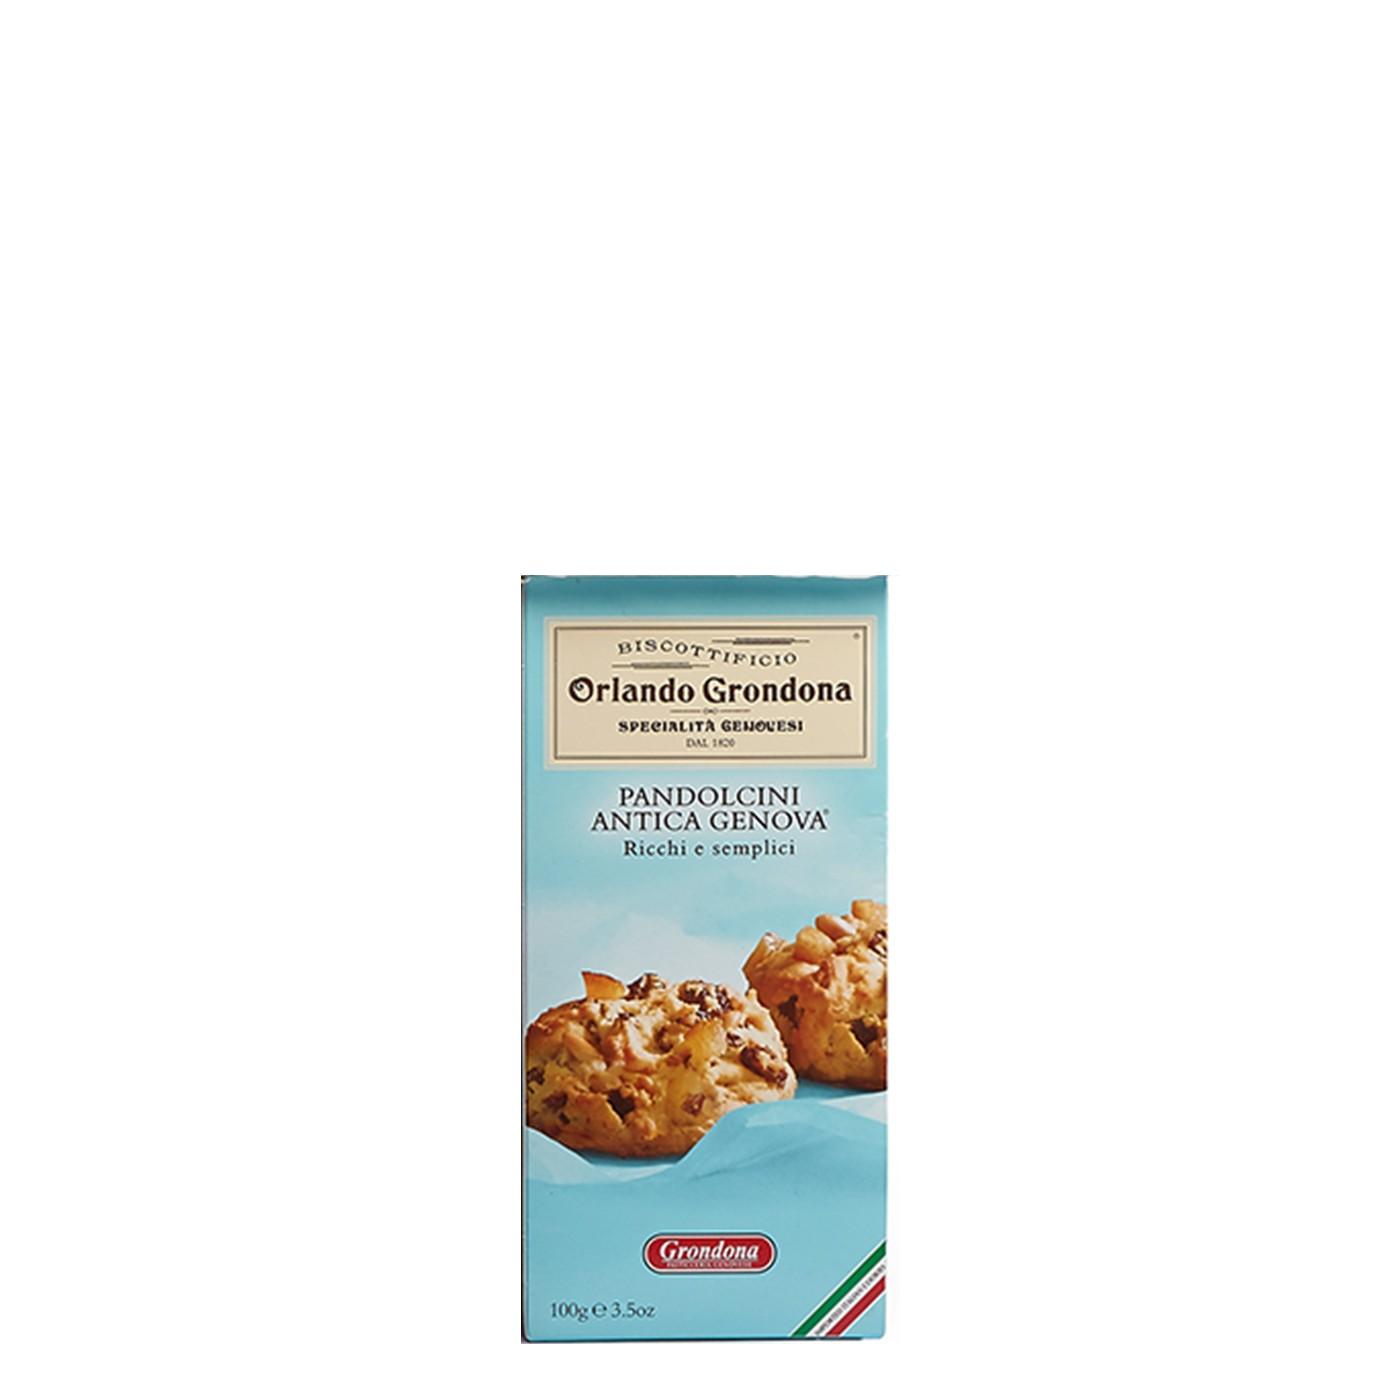 Pandolcino Cookies 3.5oz